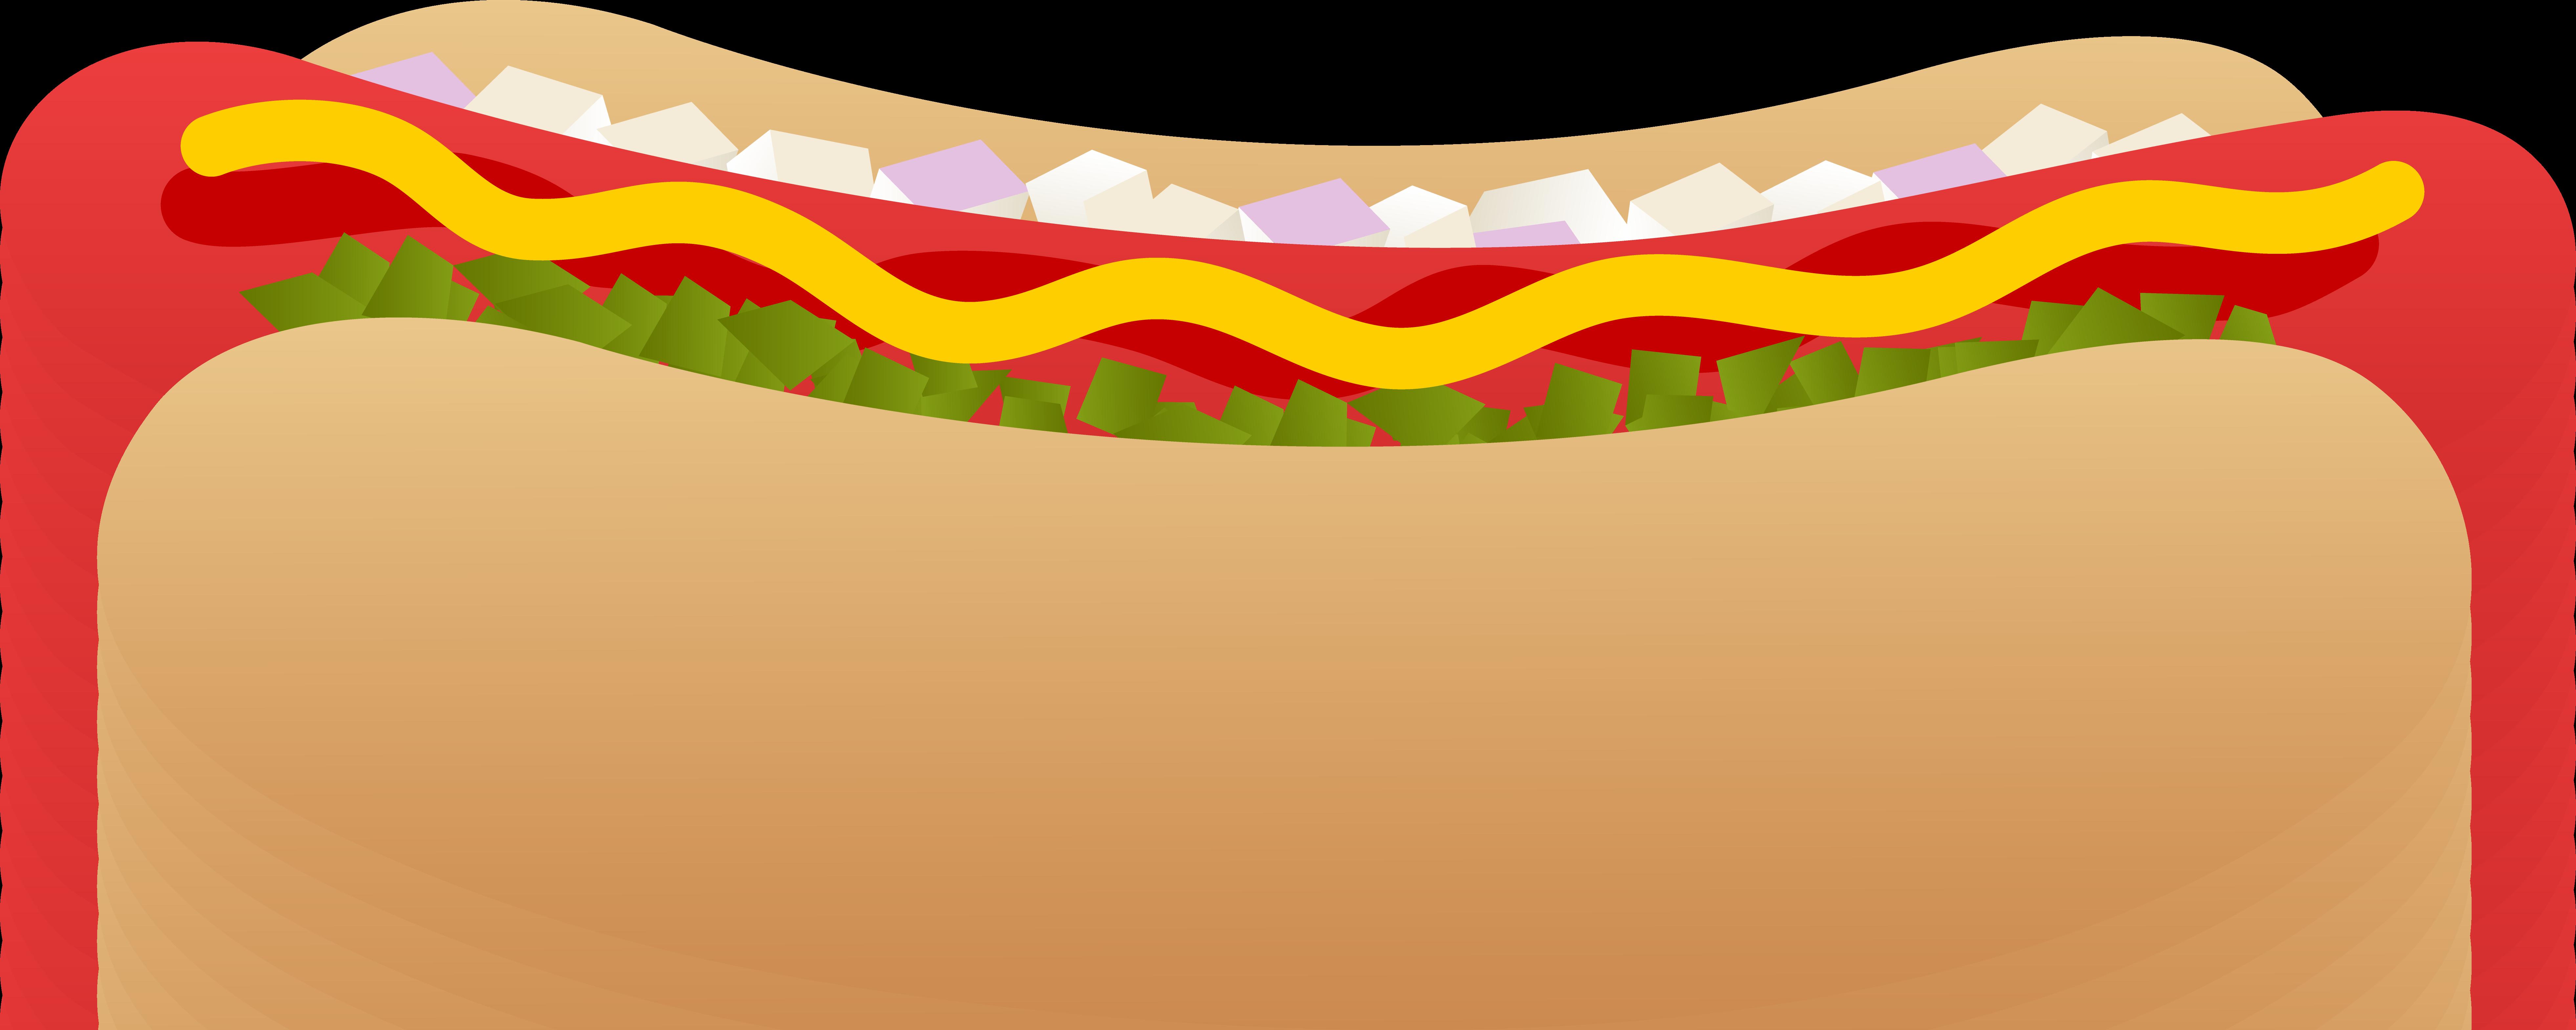 PNG Hamburgers Hot Dogs - 50187